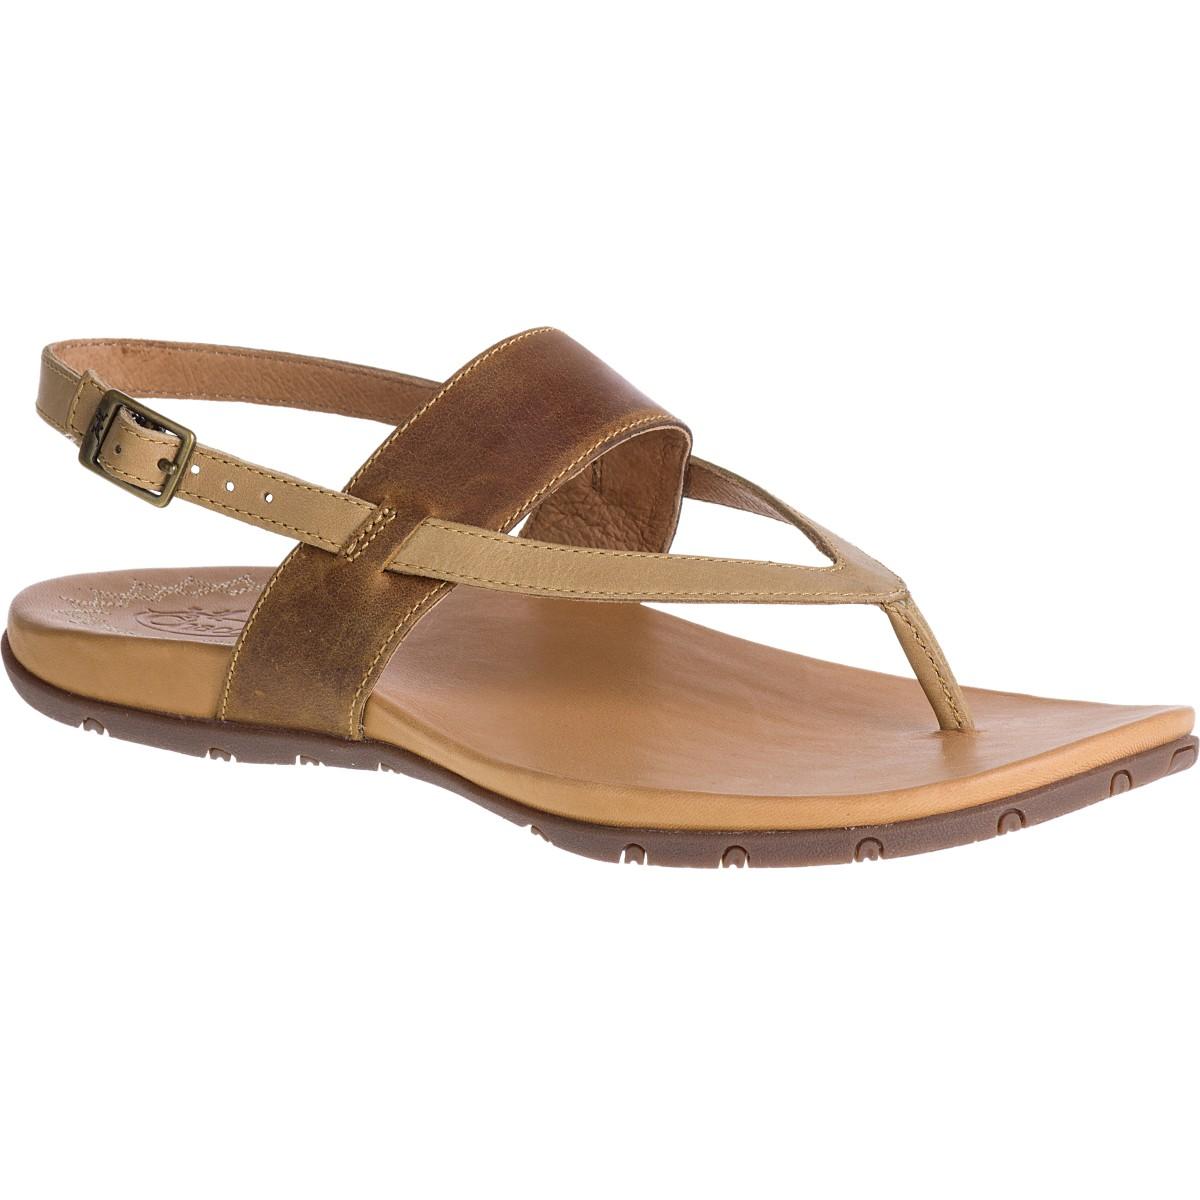 973b40c89eb4 Chaco - Maya II Women s Leather Sandals - Footwear-Women s   Living ...